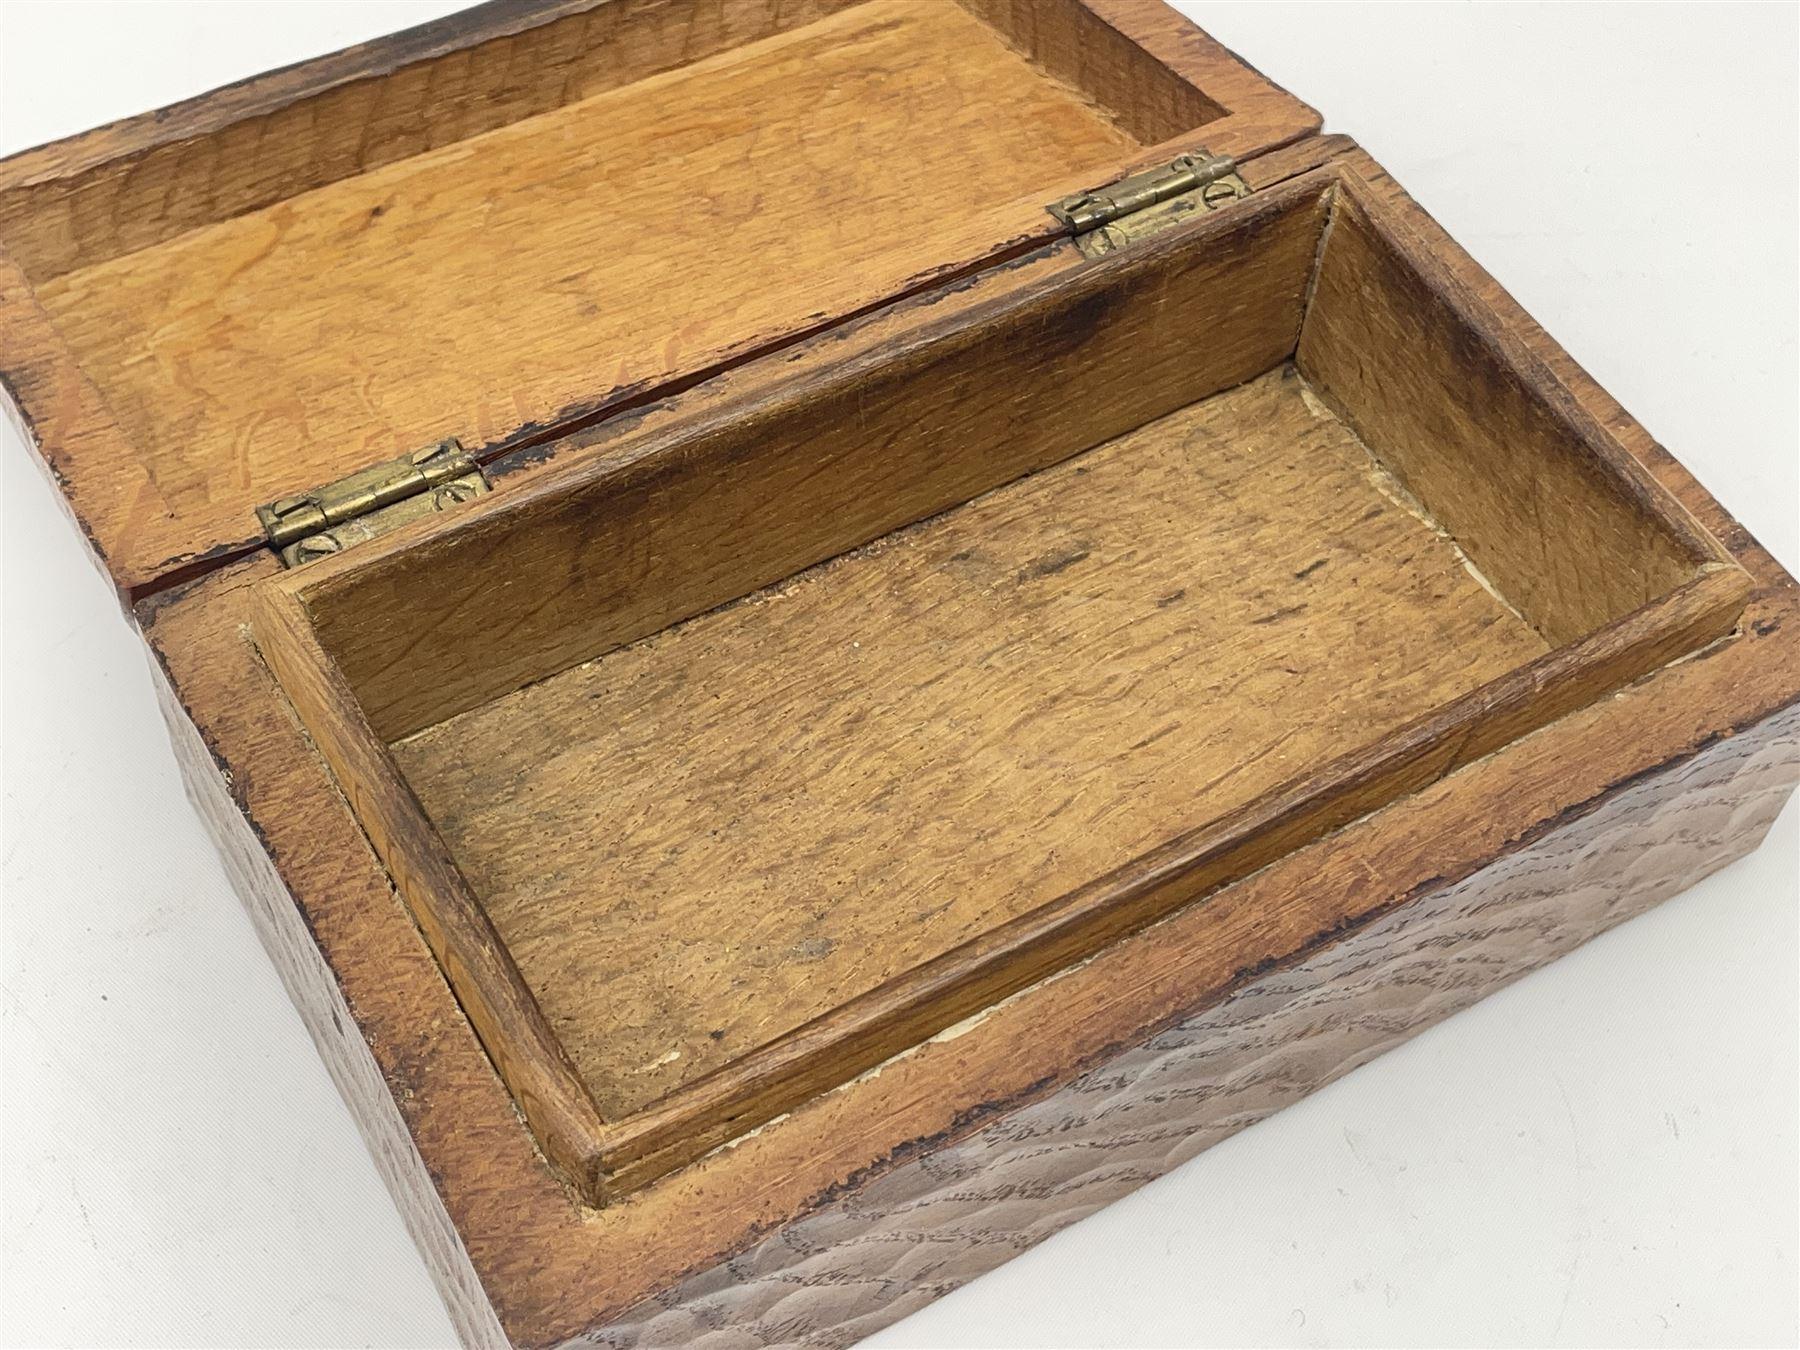 'Gnomeman' tooled oak trinket box - Image 6 of 6